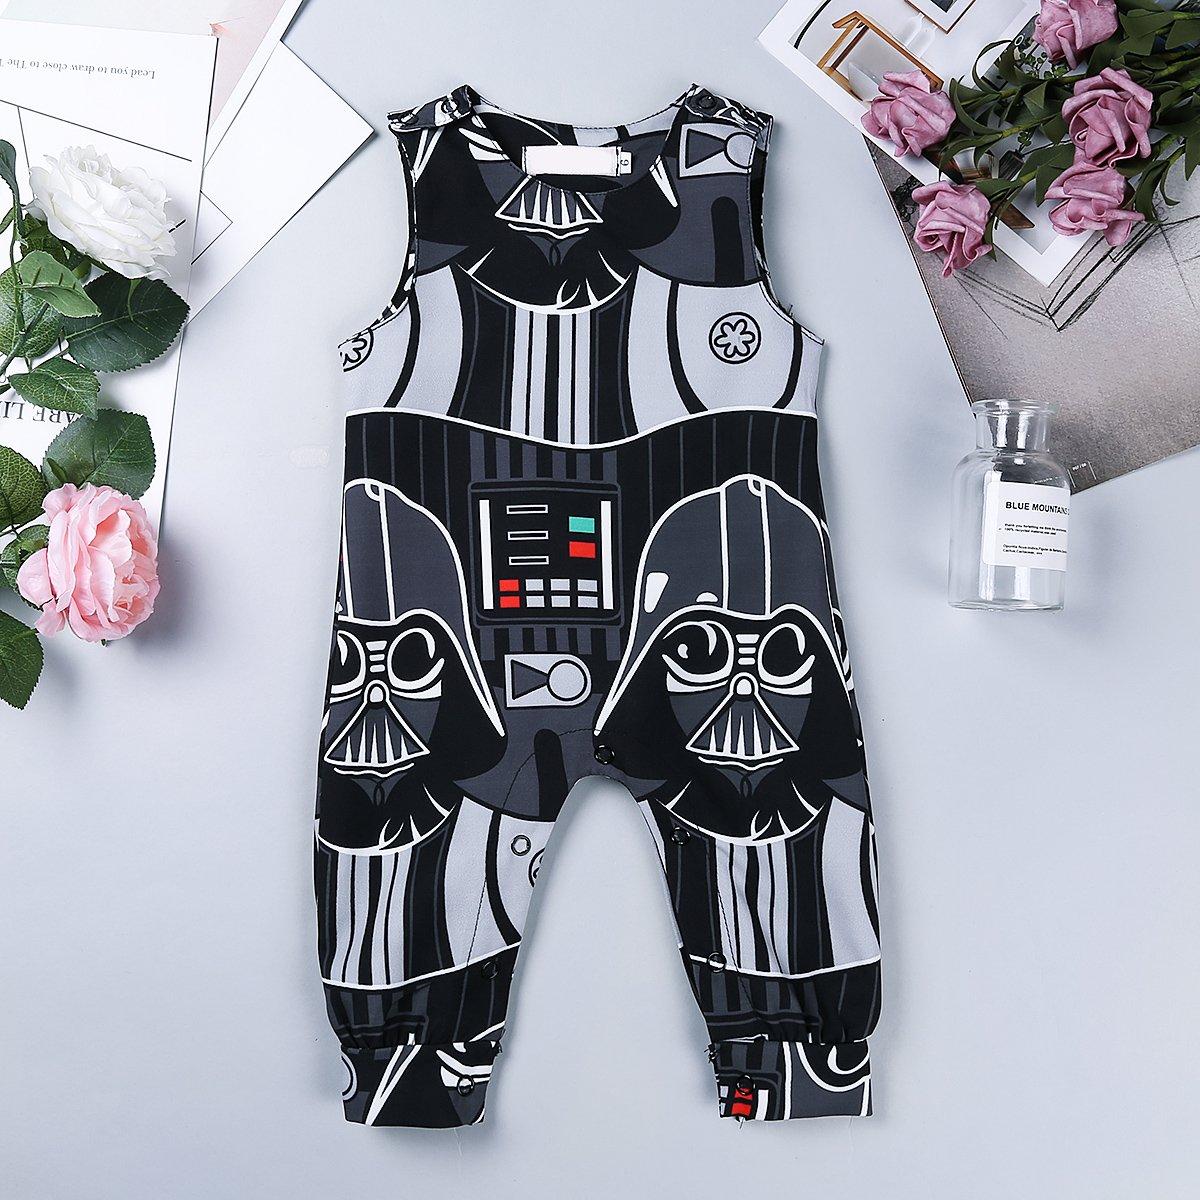 Freebily Infant Baby Boys Romper Sleeveless Printed Pattern Tops Jumpsuit